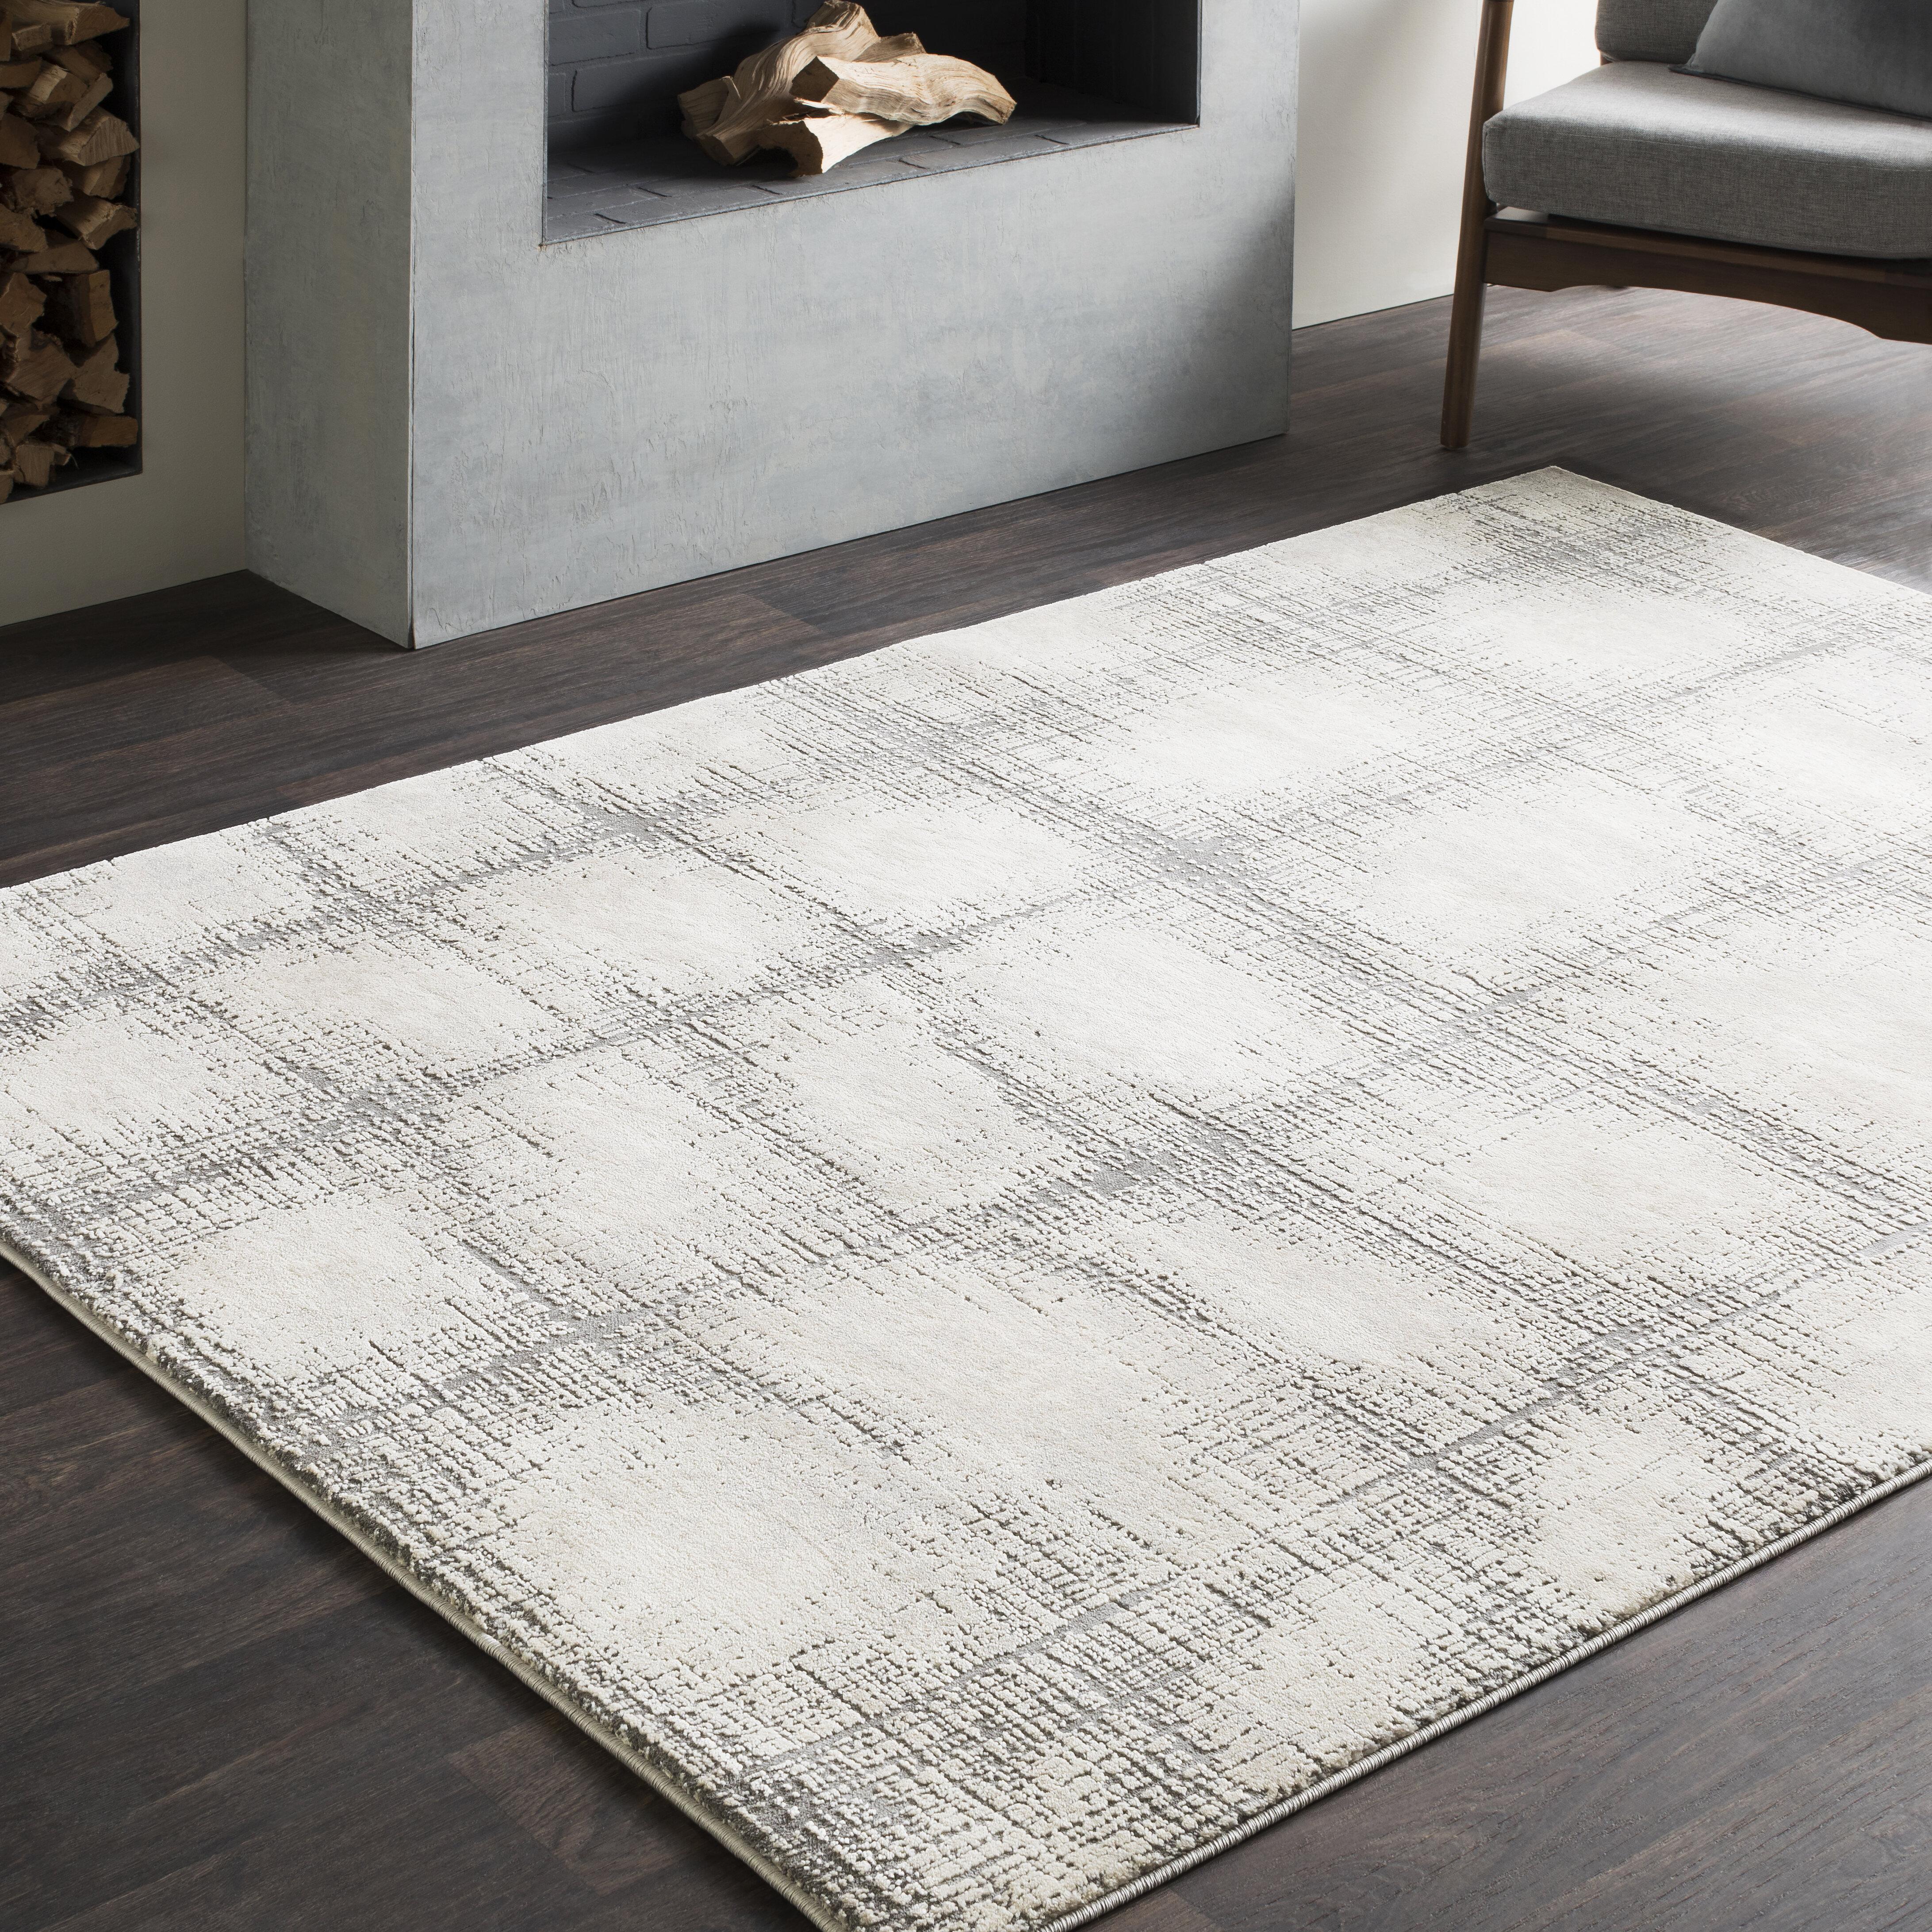 com nylon grey shapes stainmaster dp area multiple fiber wear sizes cream plush tone and rug long oz amazon density thickness soft rich carpet